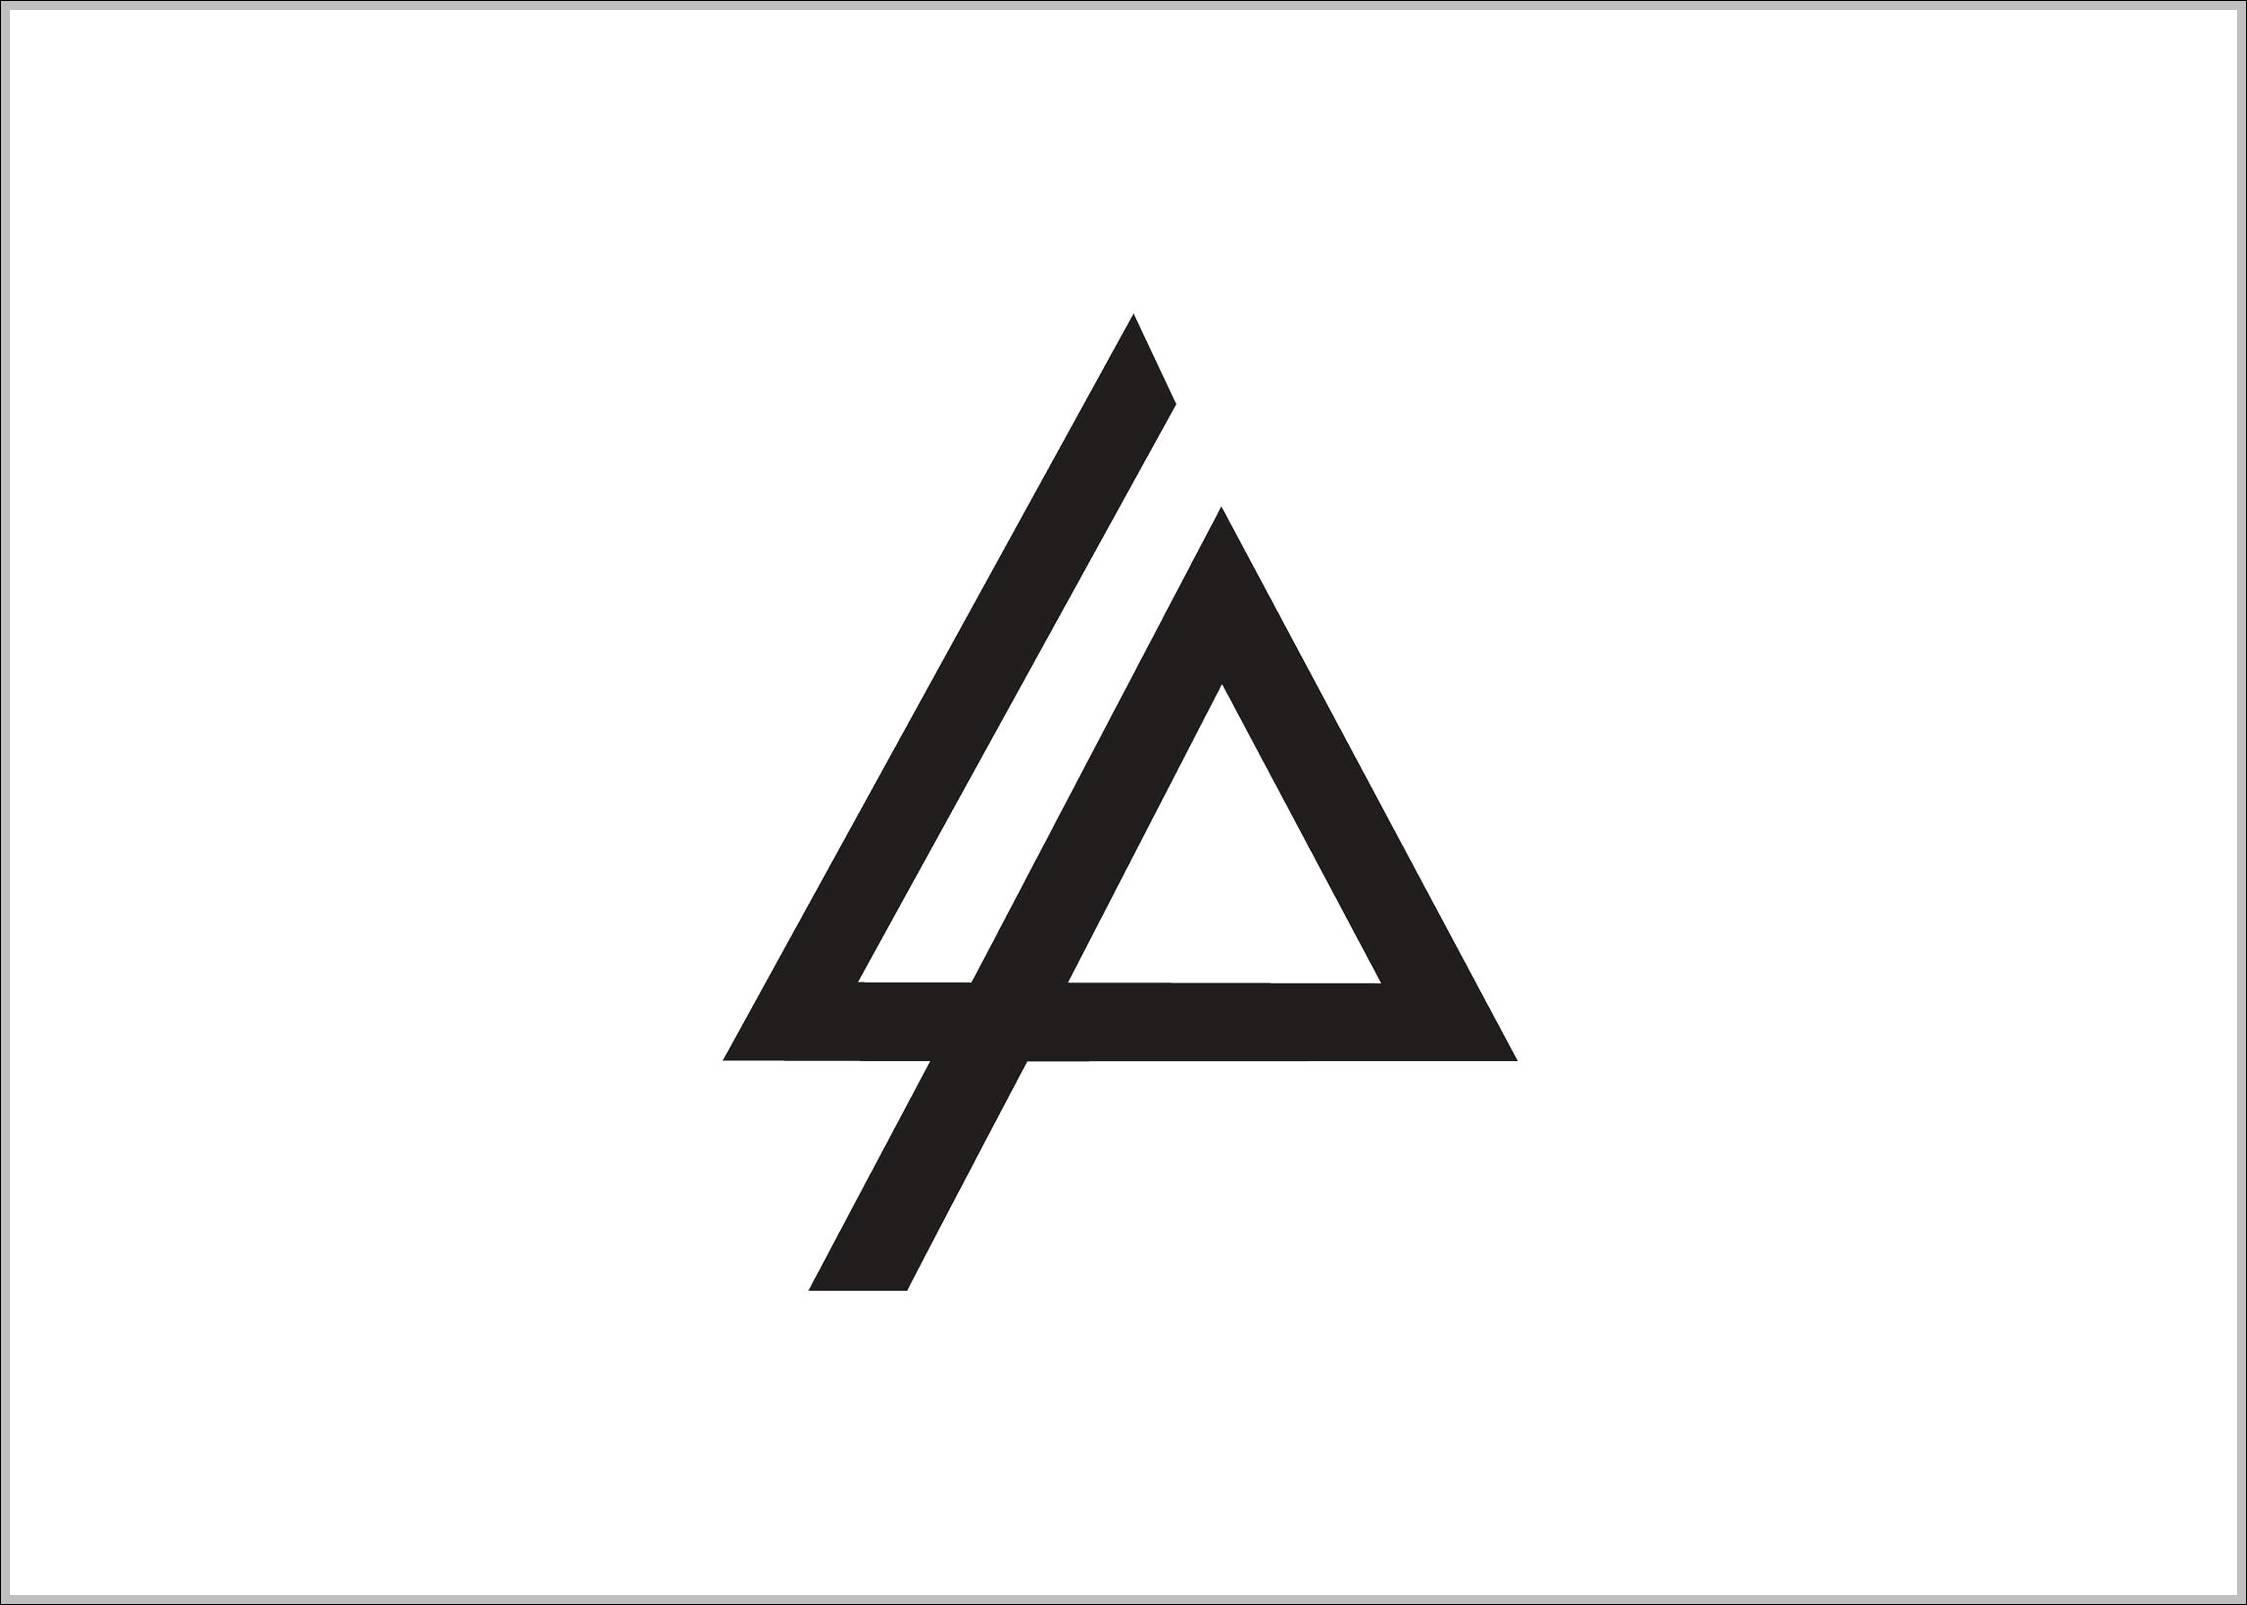 Linkin park logo logo sign logos signs symbols trademarks linkin park logo biocorpaavc